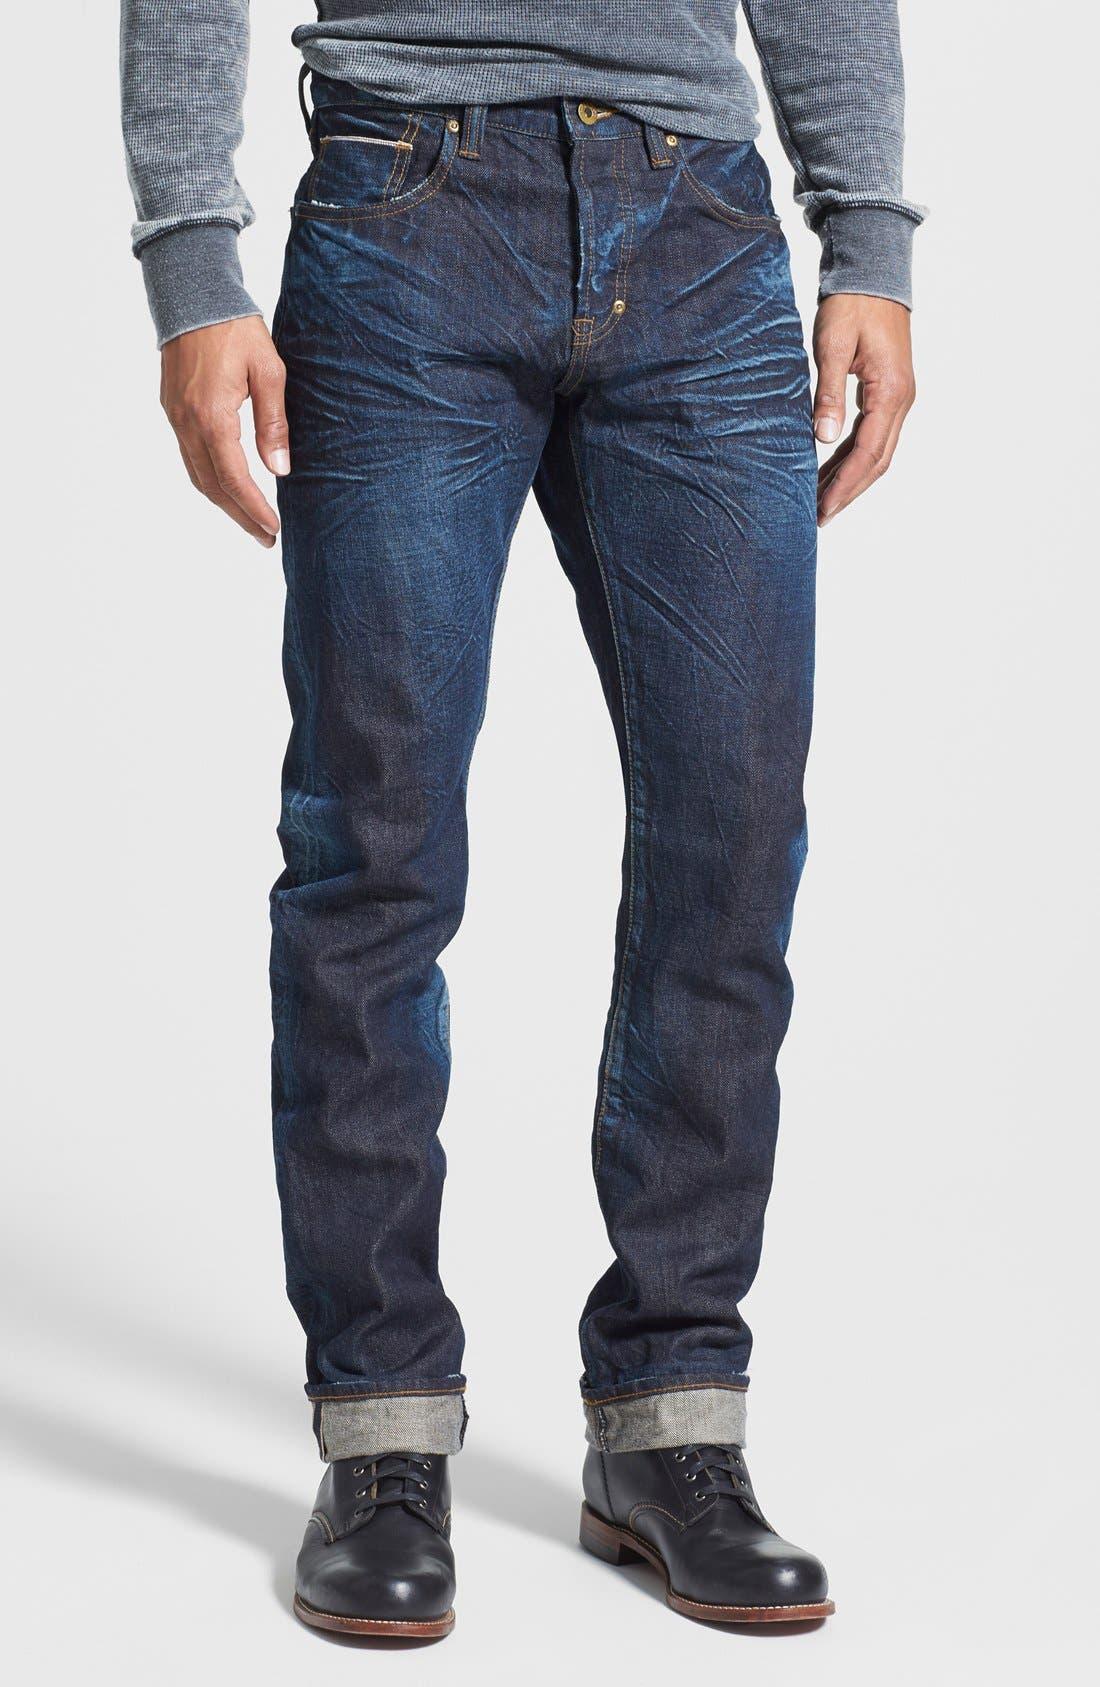 Alternate Image 1 Selected - PRPS 'Demon' Slim Straight Leg Selvedge Jeans (6 Month)